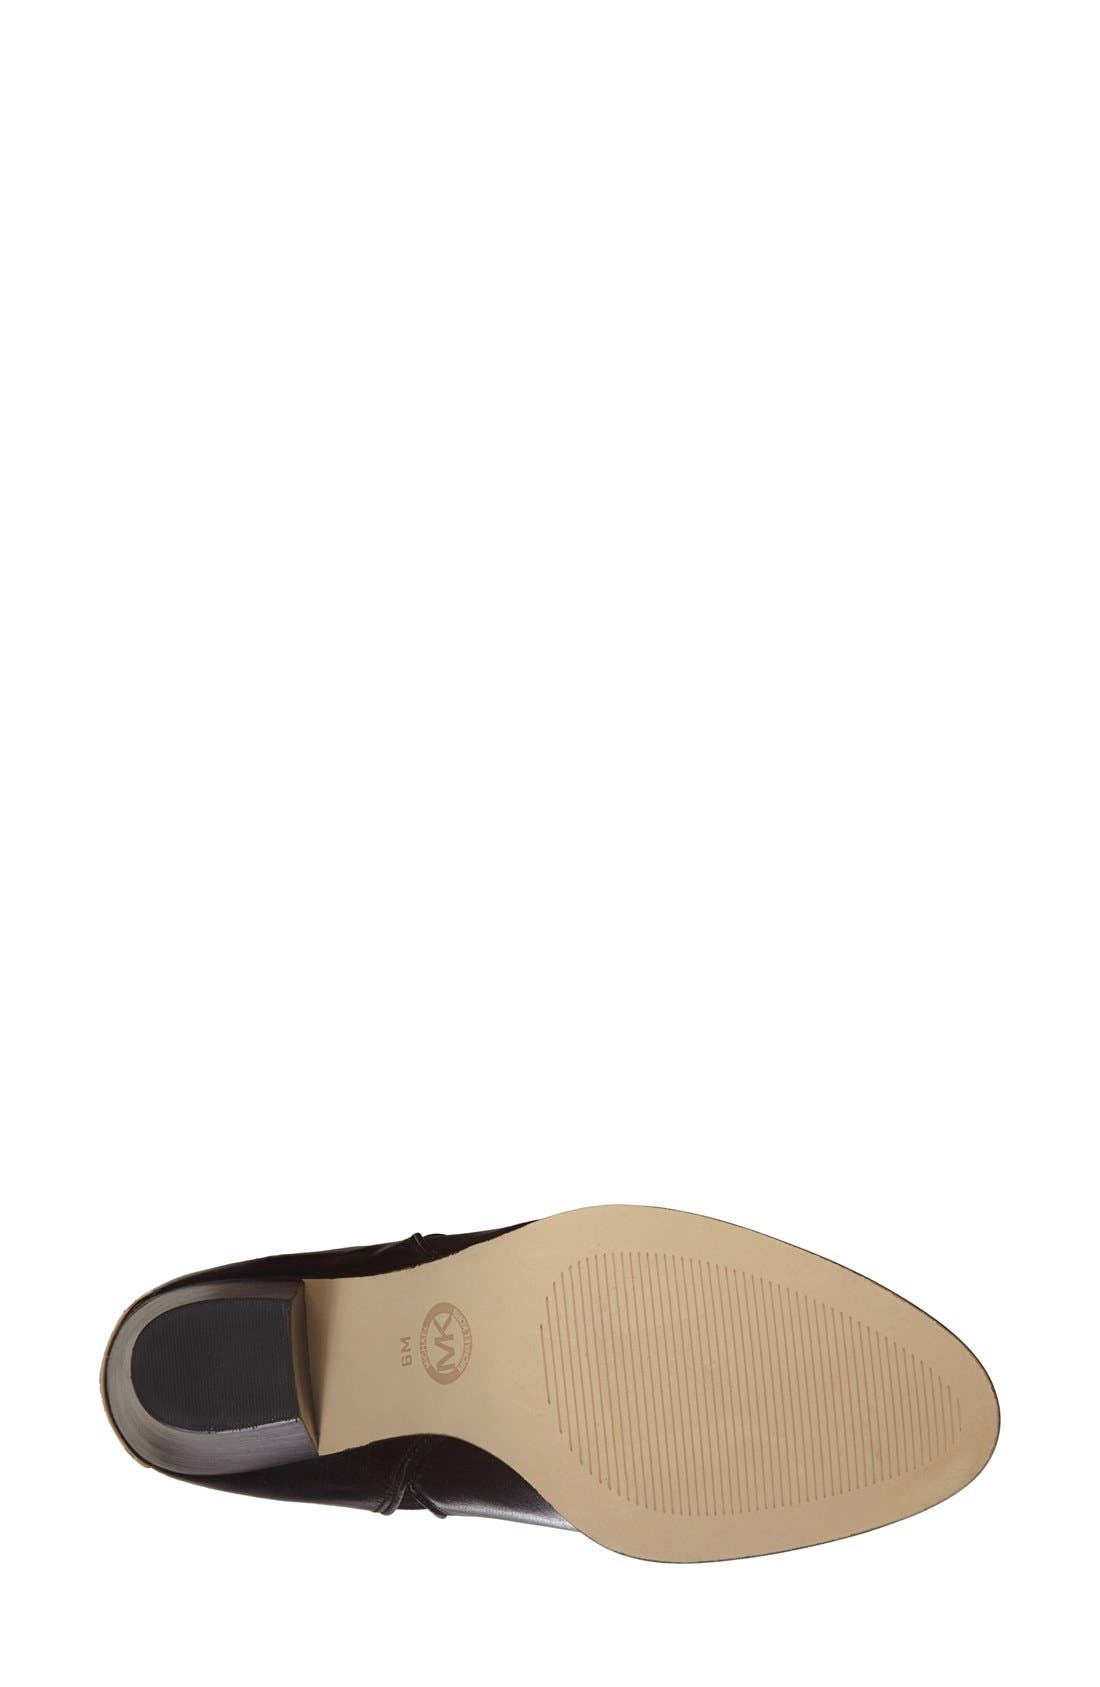 Alternate Image 4  - MICHAEL Michael Kors 'Brandy' Leather Bootie (Women)